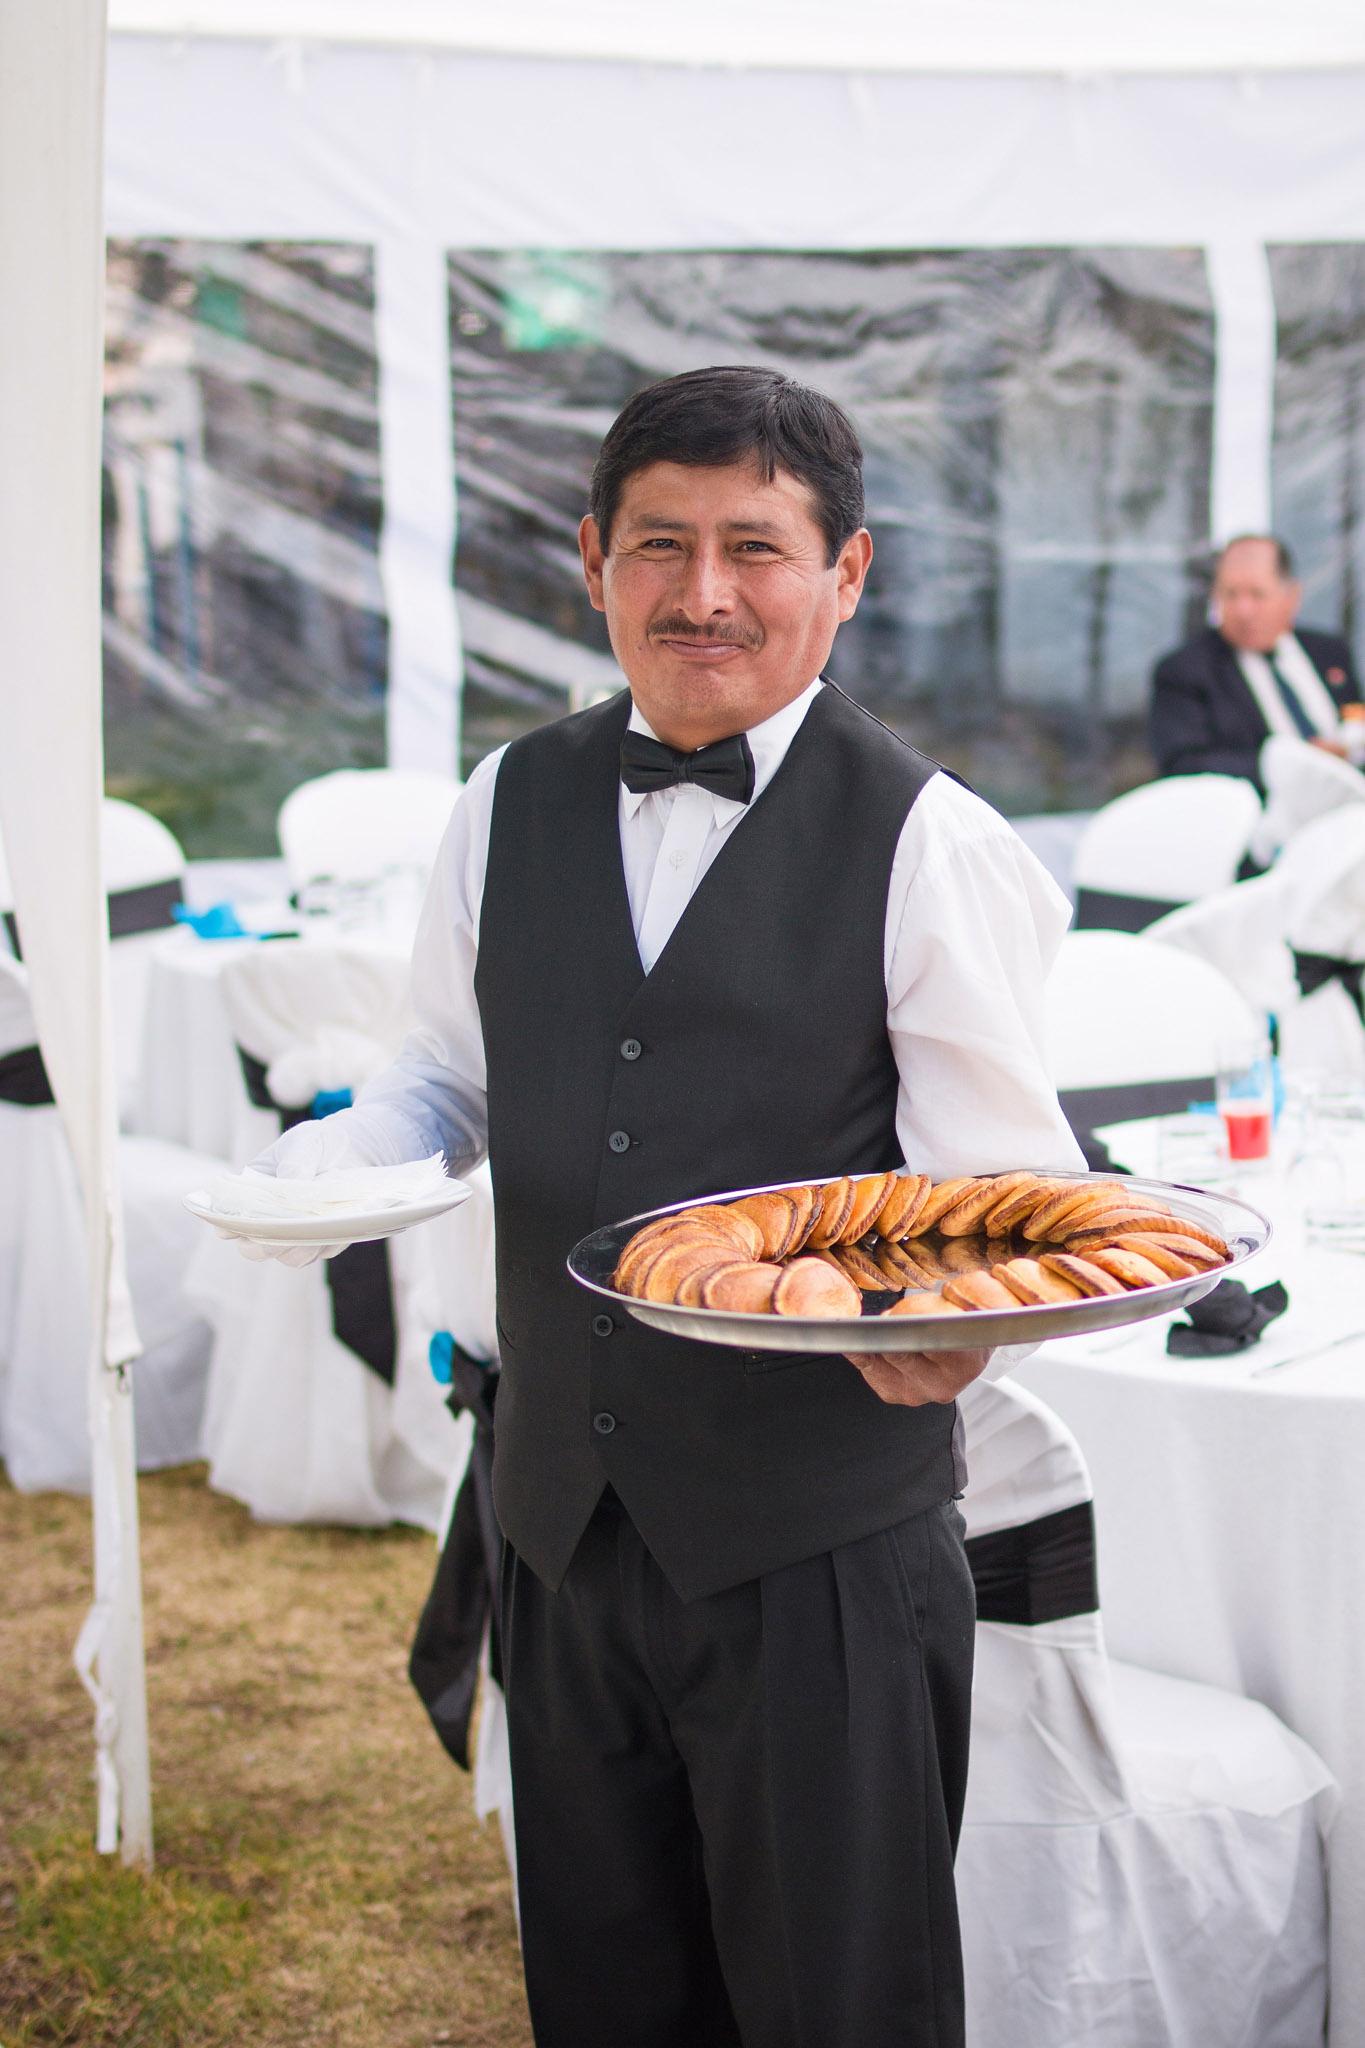 saltenas-bolivia-wedding-food